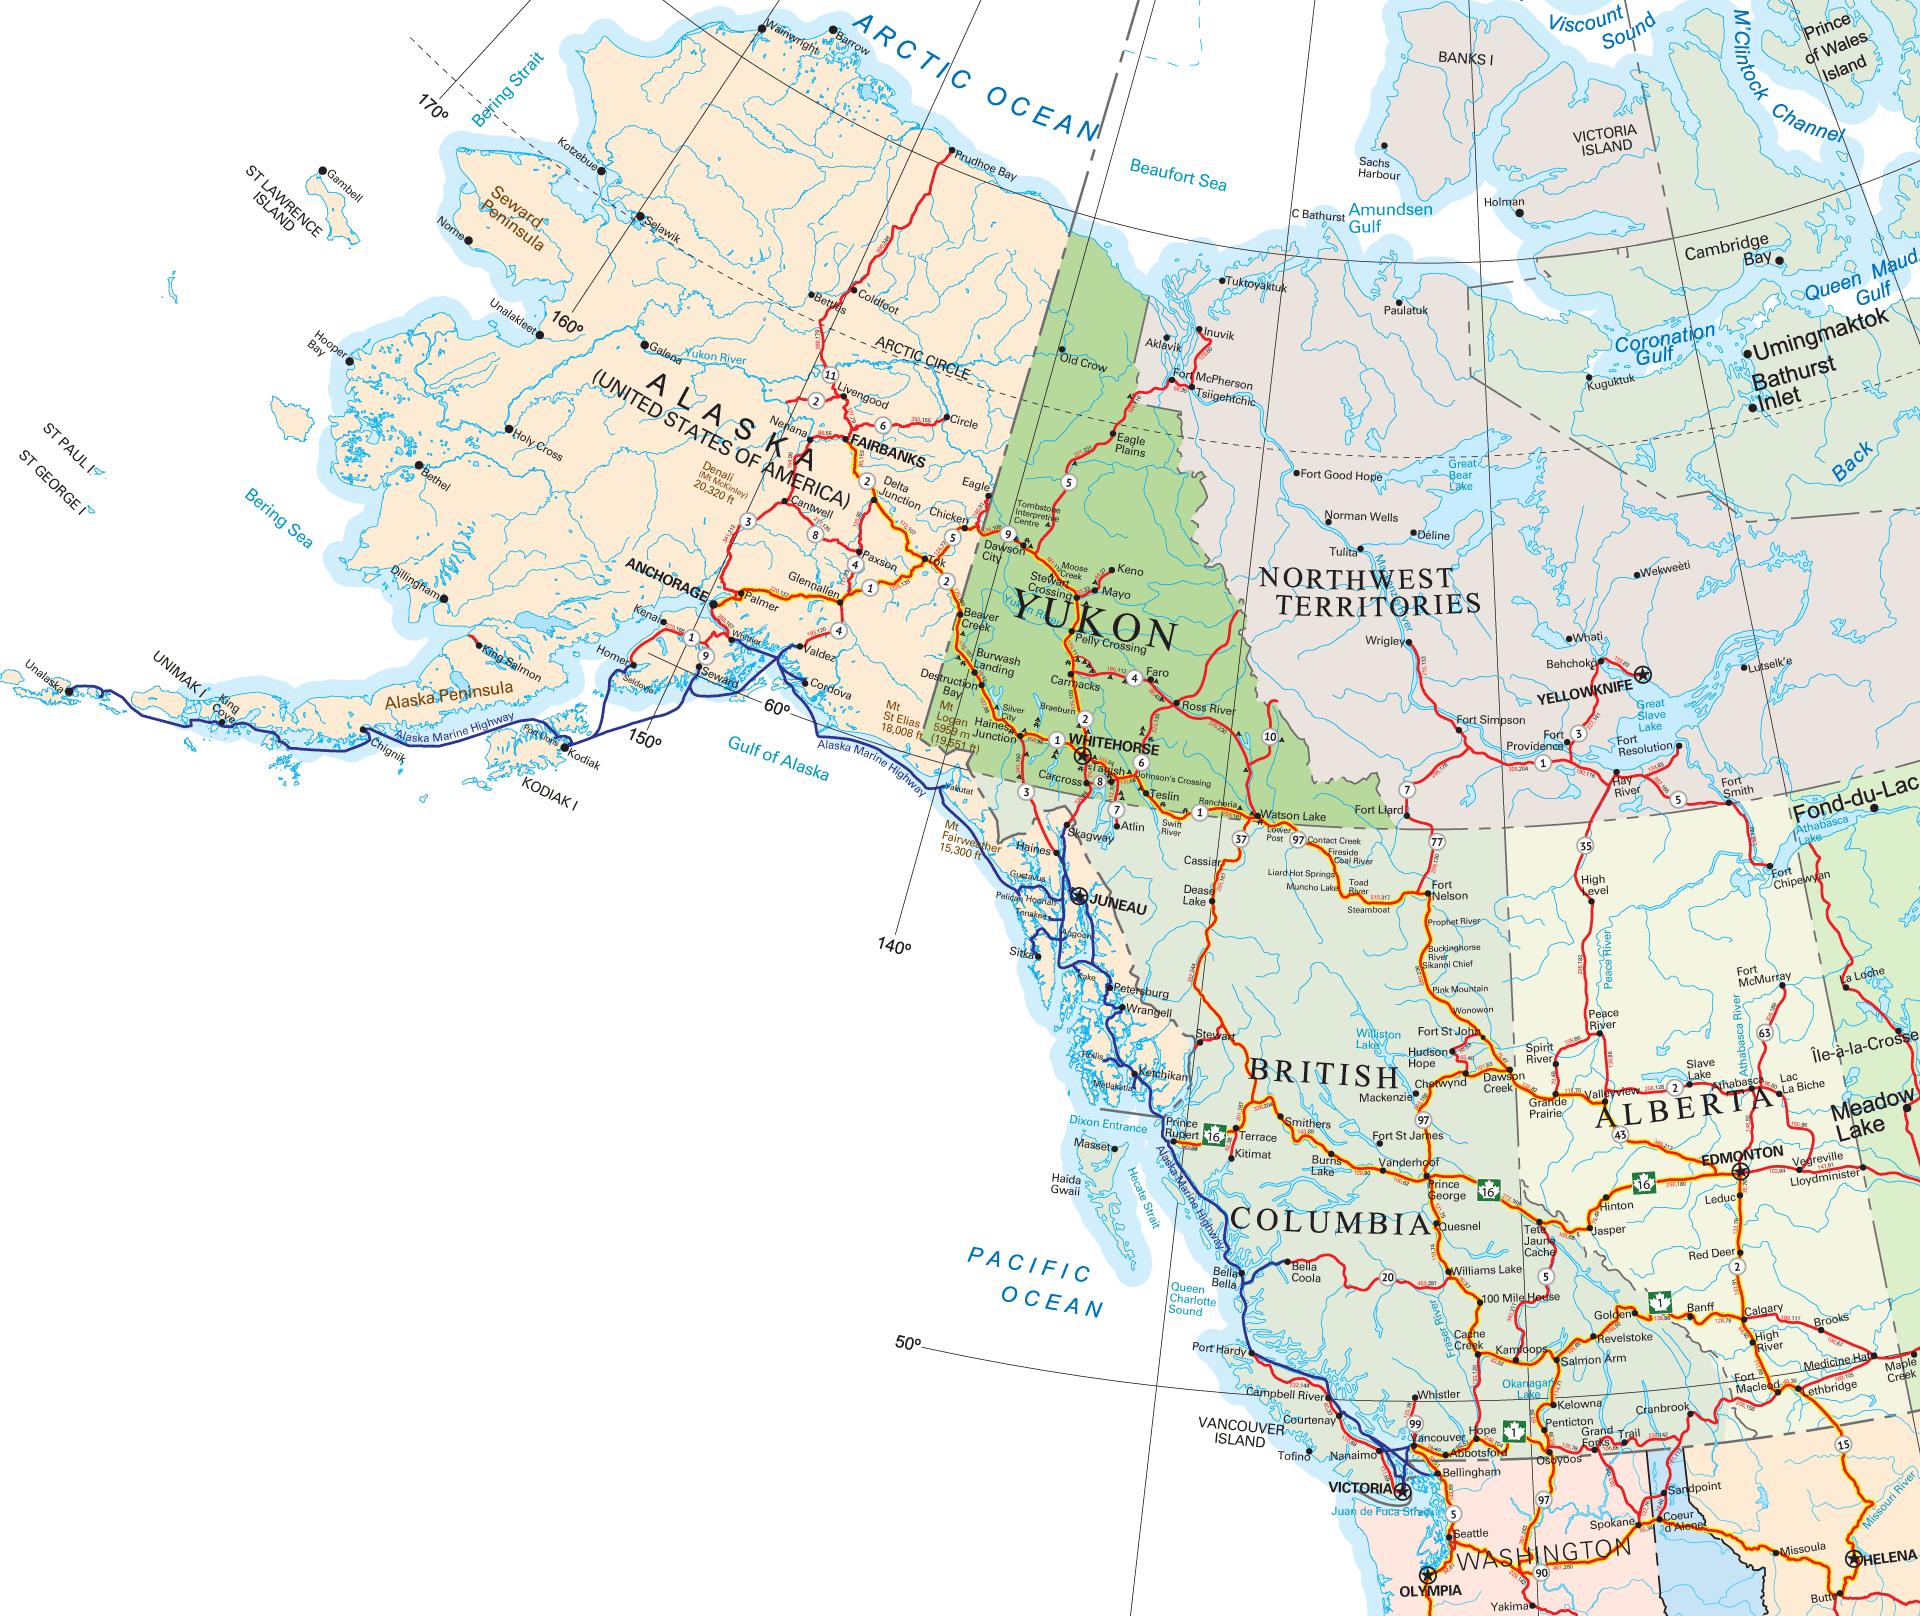 Northwest North America